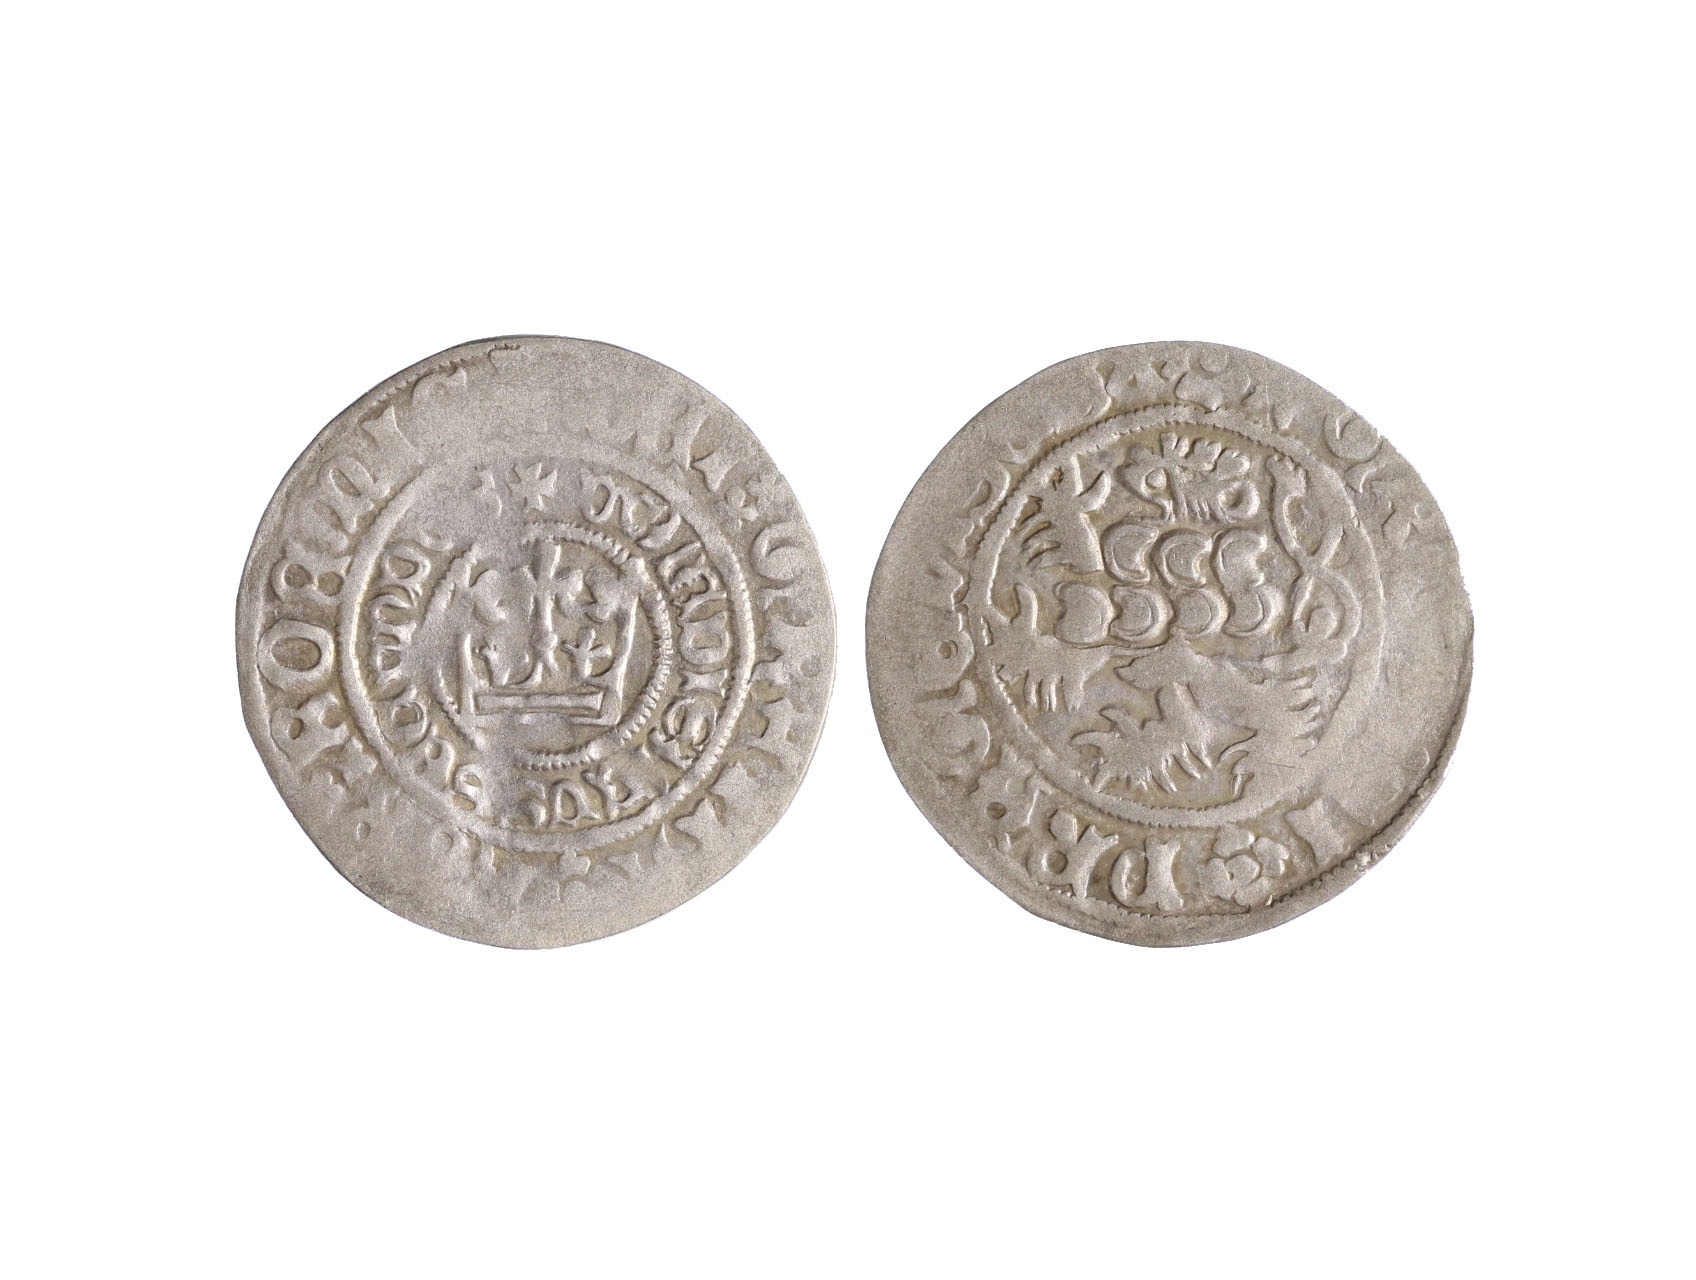 Vladislav II. Jagellonský 1471-1516 - Pražský groš b.l. nedoražen